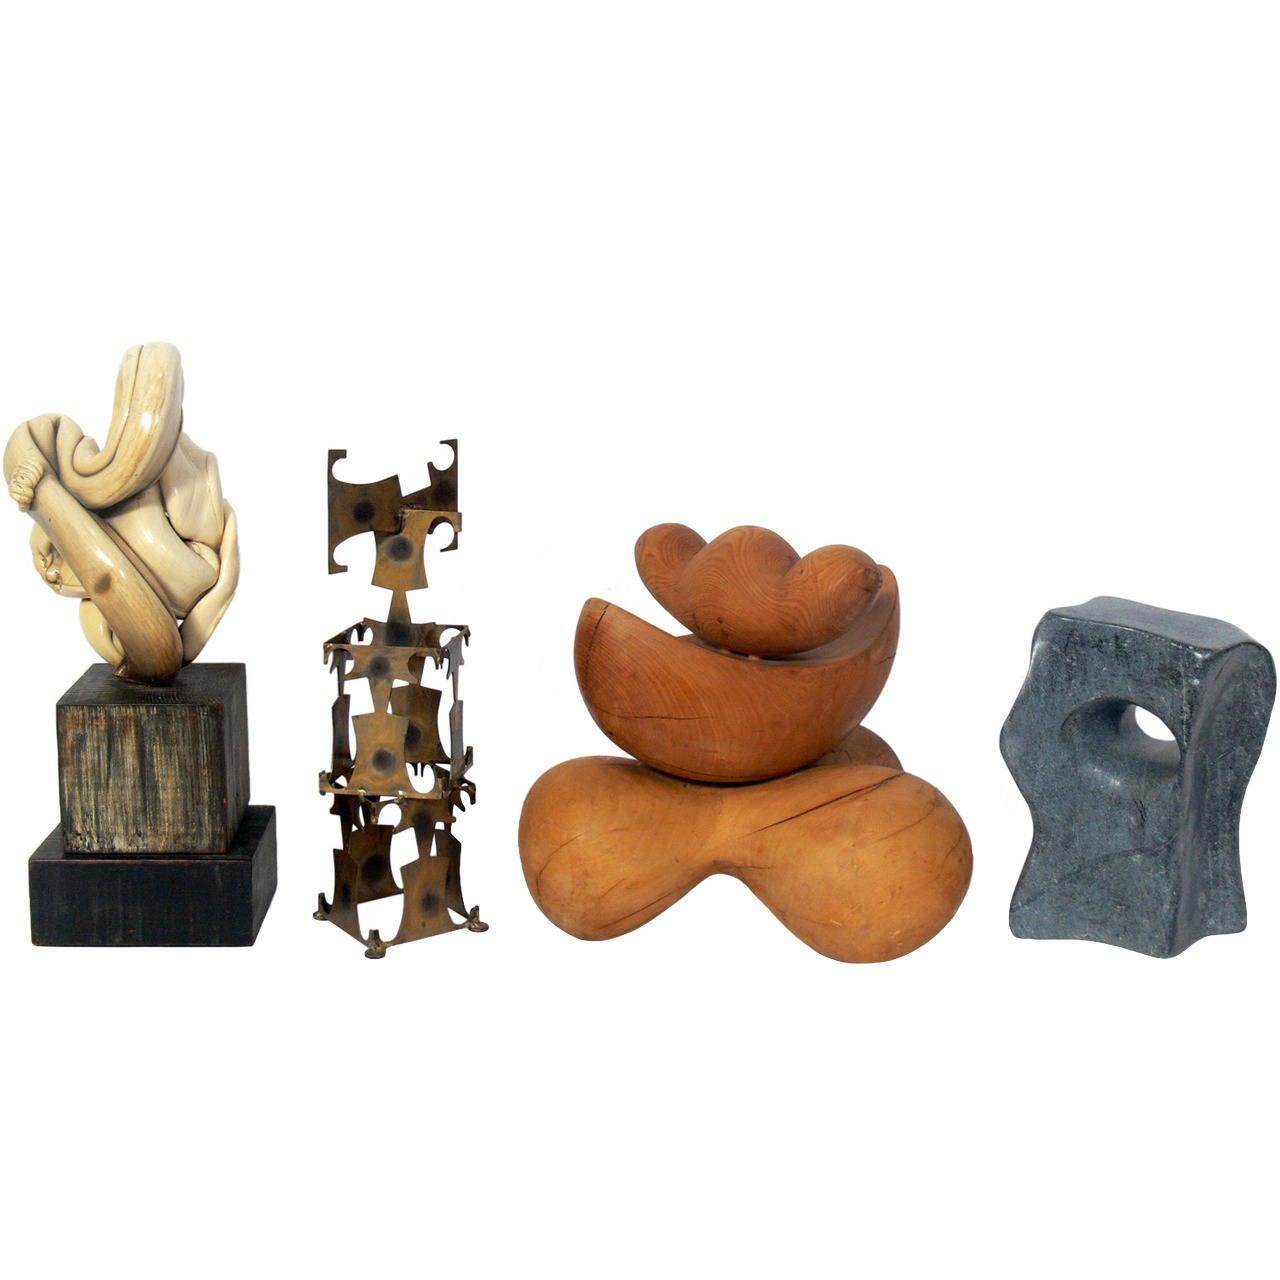 Group of Modernist Sculptures